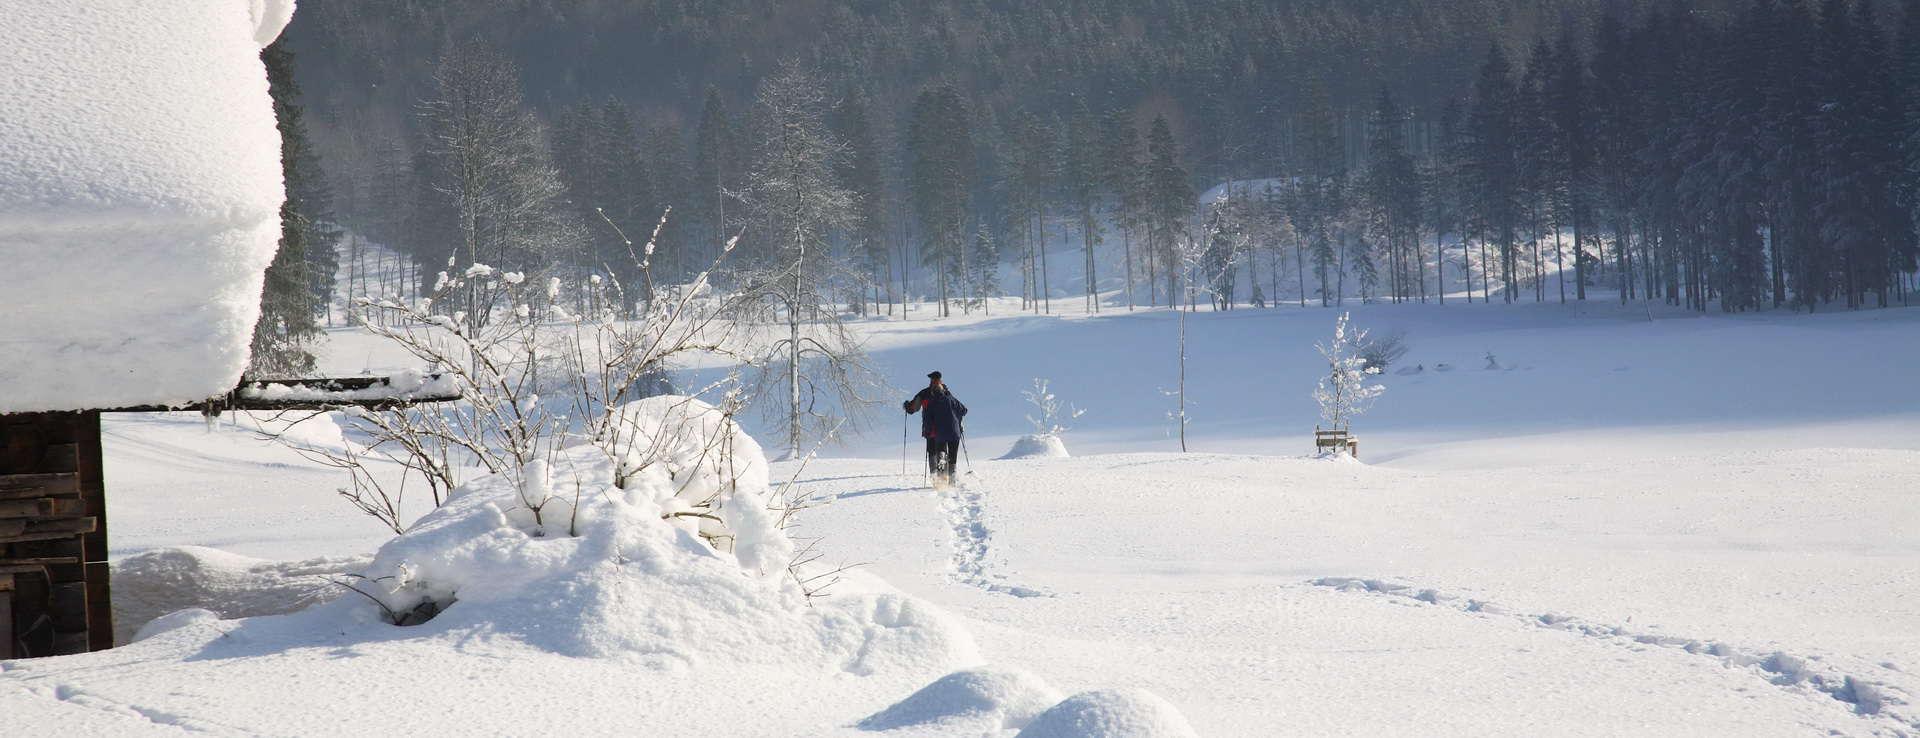 Snösko snöskovandring Rettenbachalm Österrike skidsemester vinter